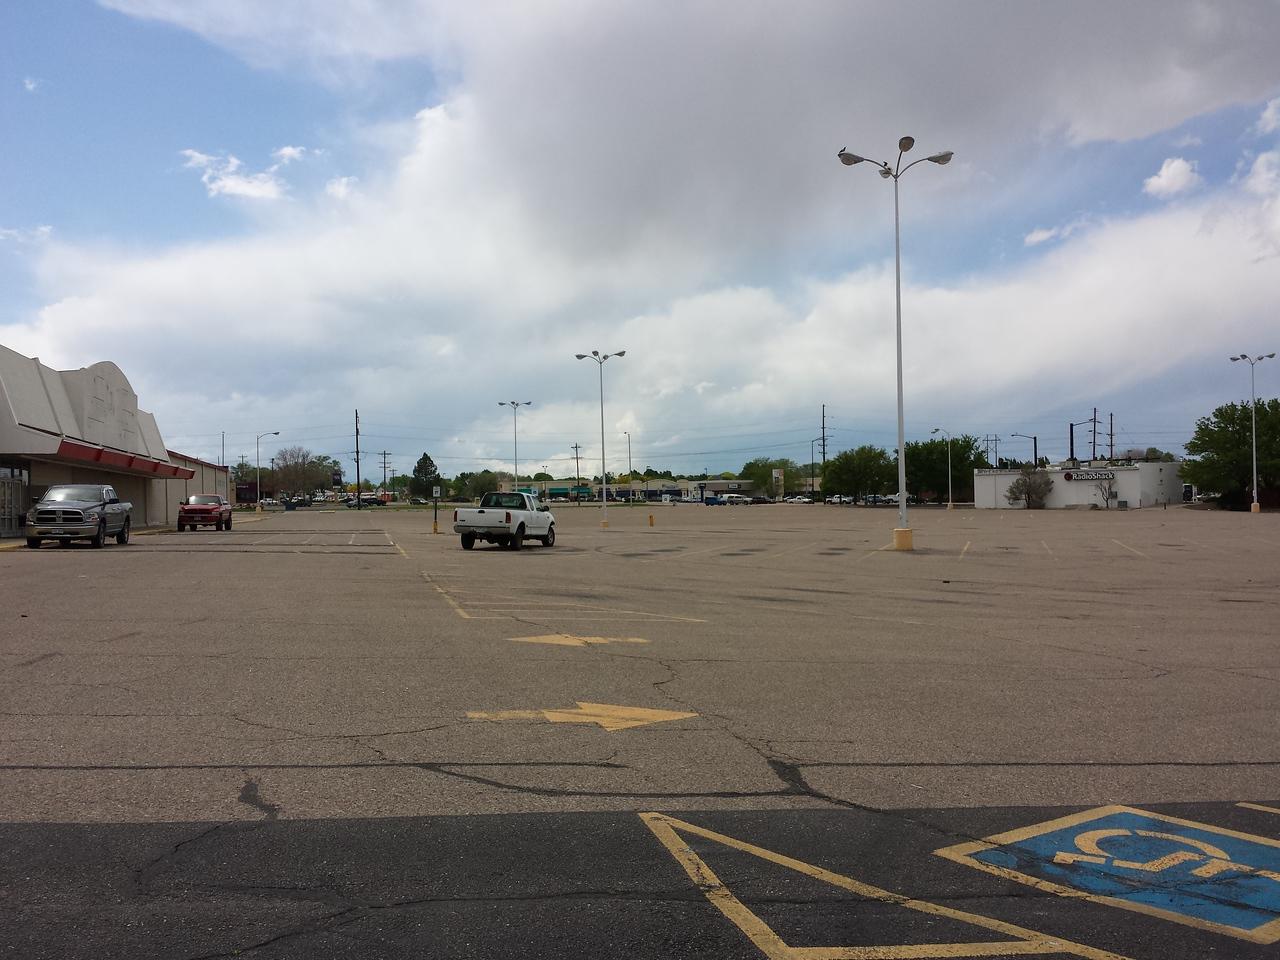 Kmart, furs, radioshack closing on pueblo Boulevard